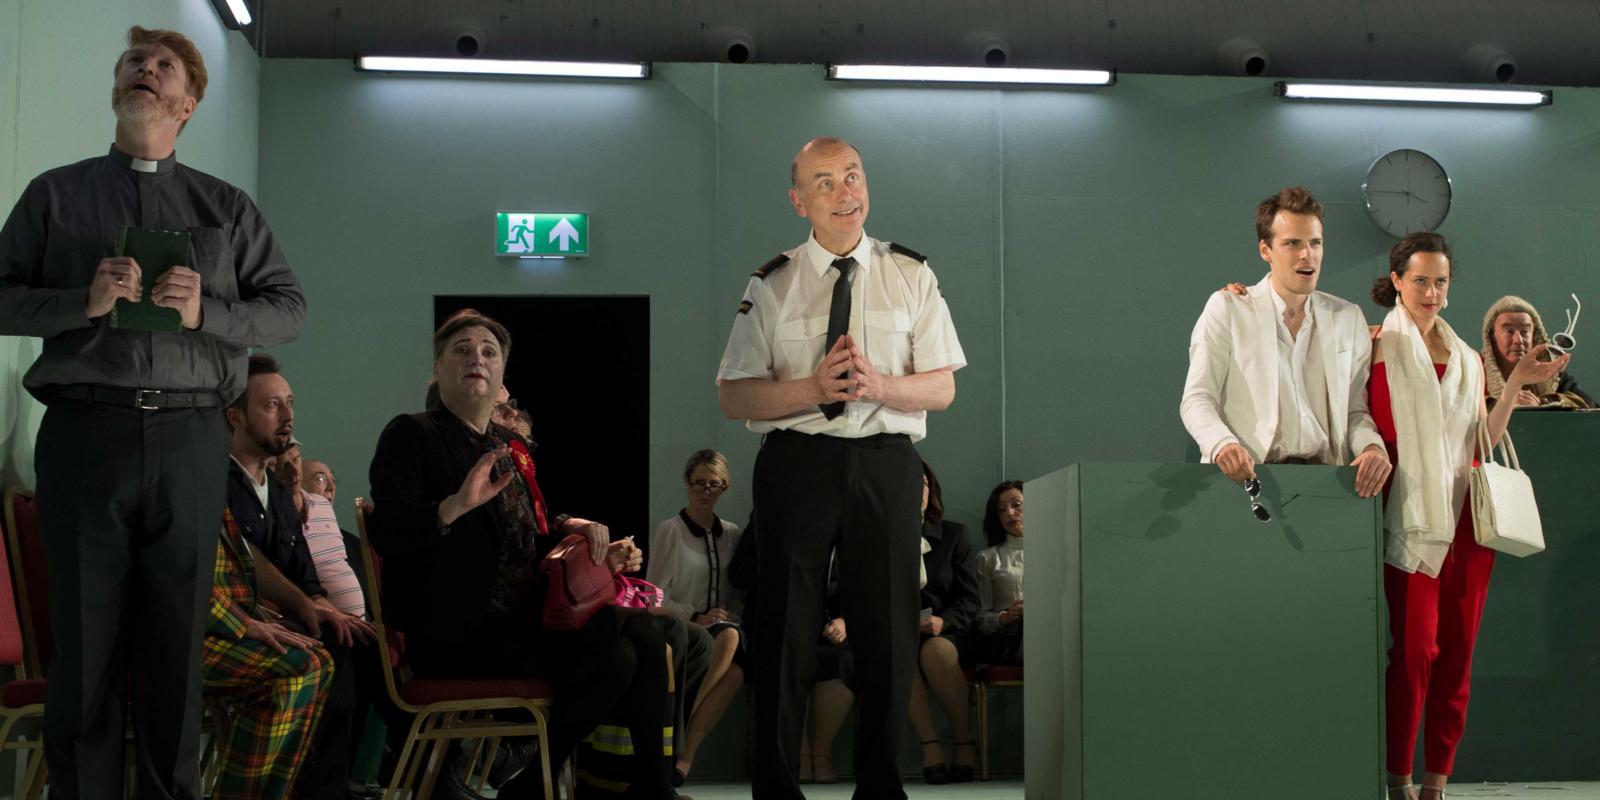 ENO Studio Live Trial By Jury Production